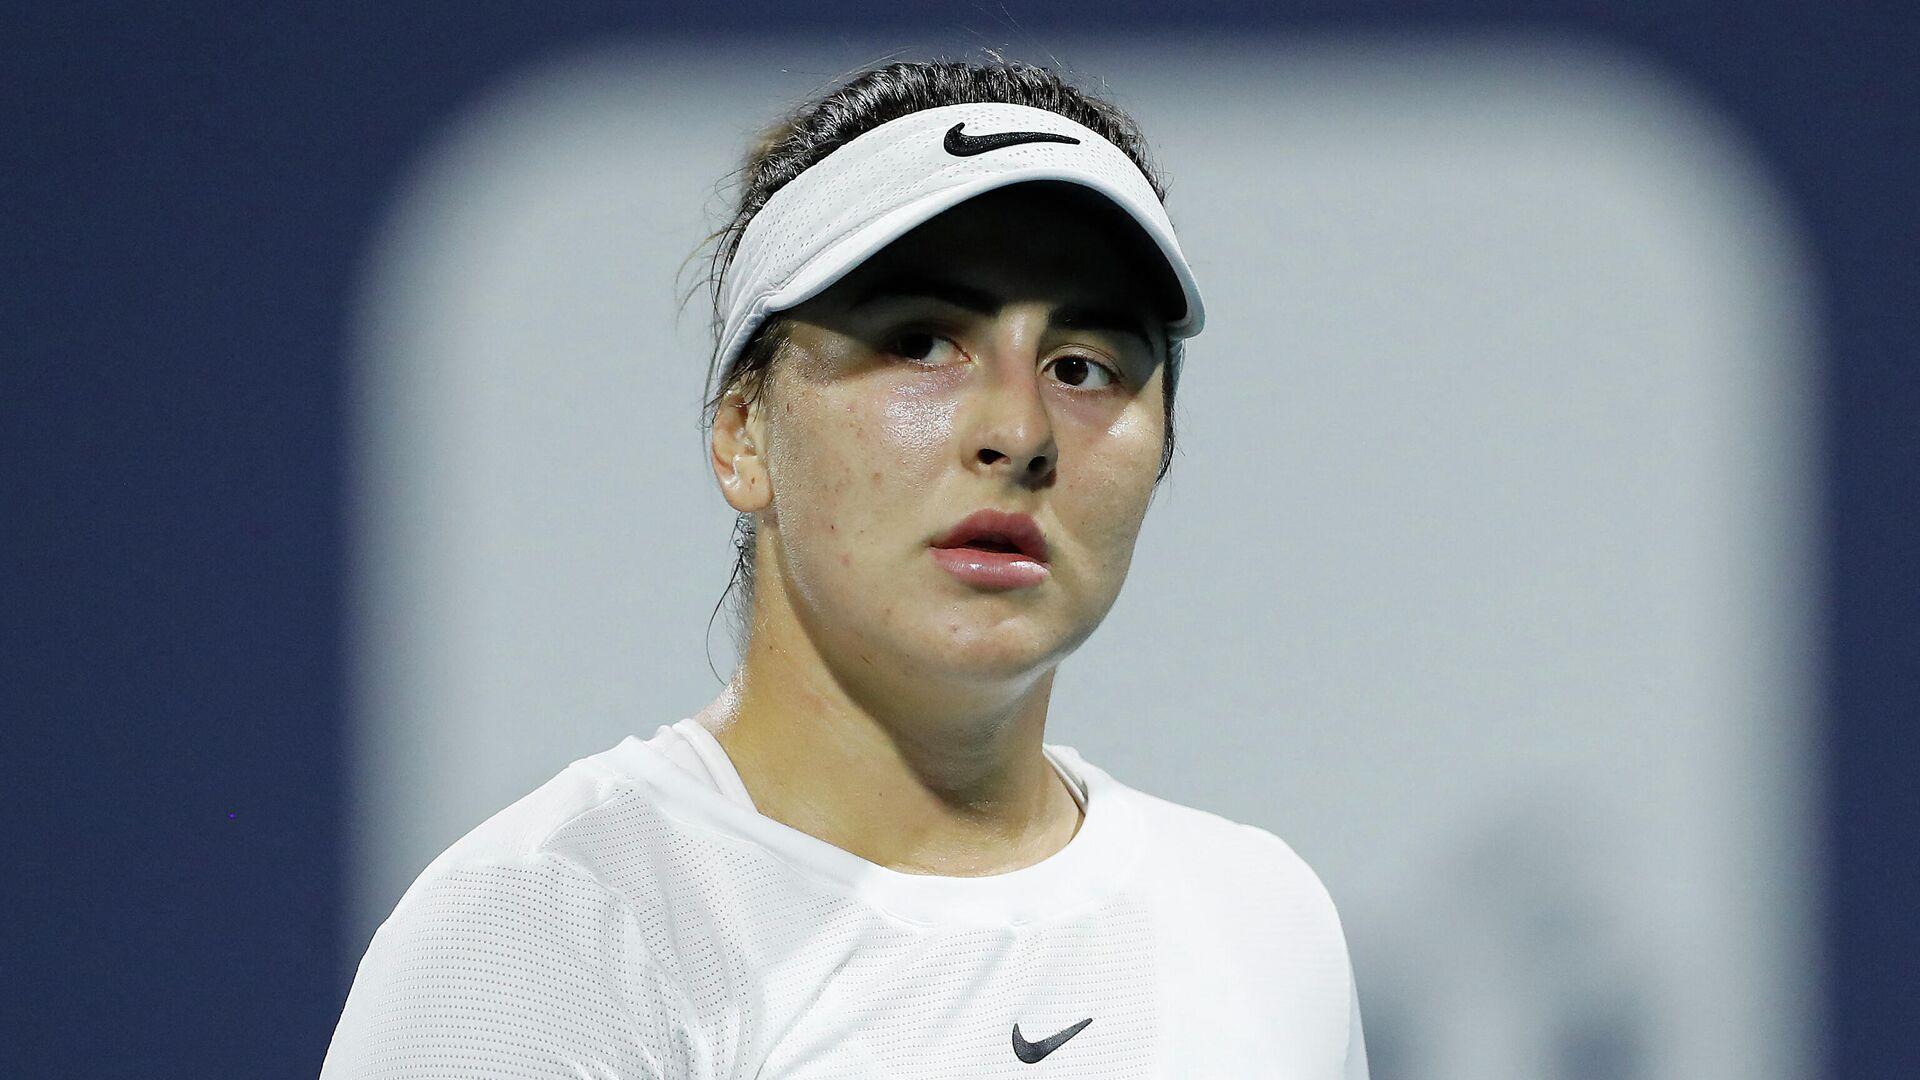 Теннисистка Бьянка Андрееску (Канада) - РИА Новости, 1920, 23.06.2021